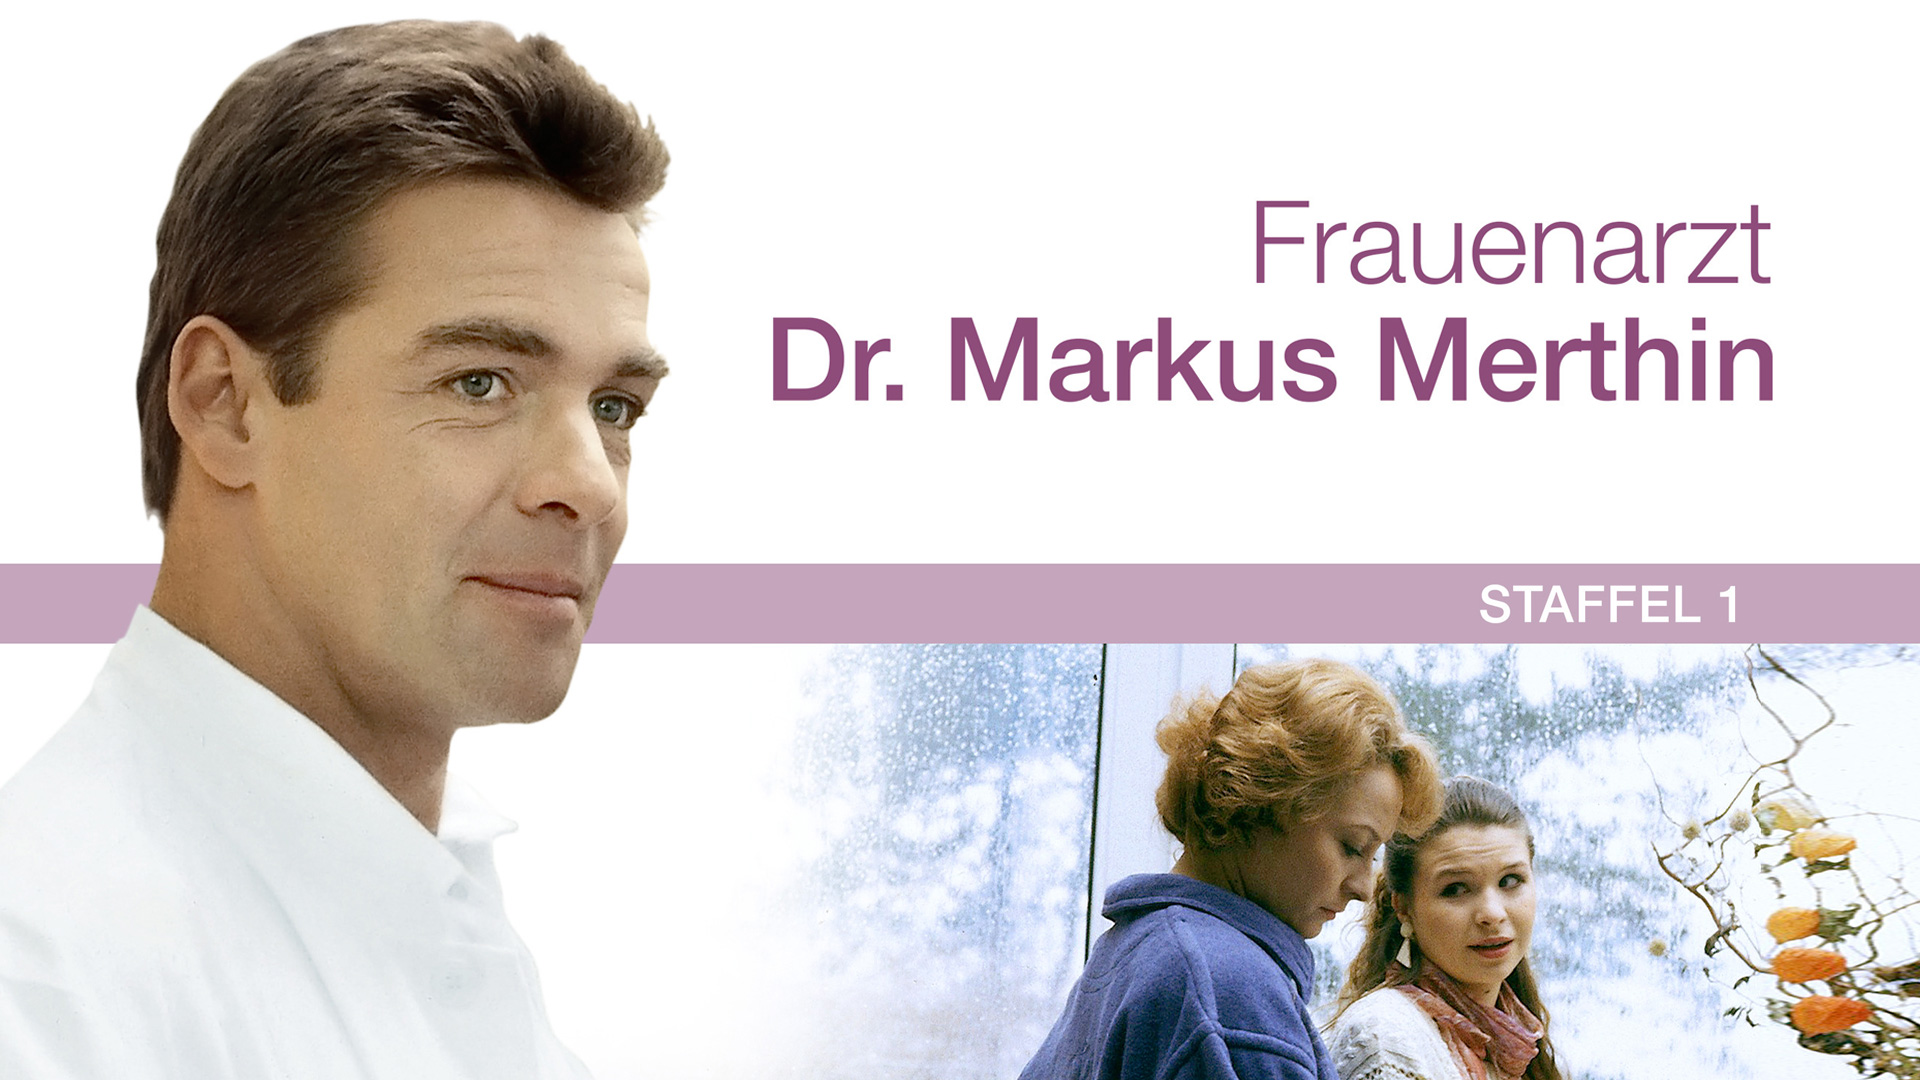 Frauenarzt Dr. Markus Merthin, Staffel 1